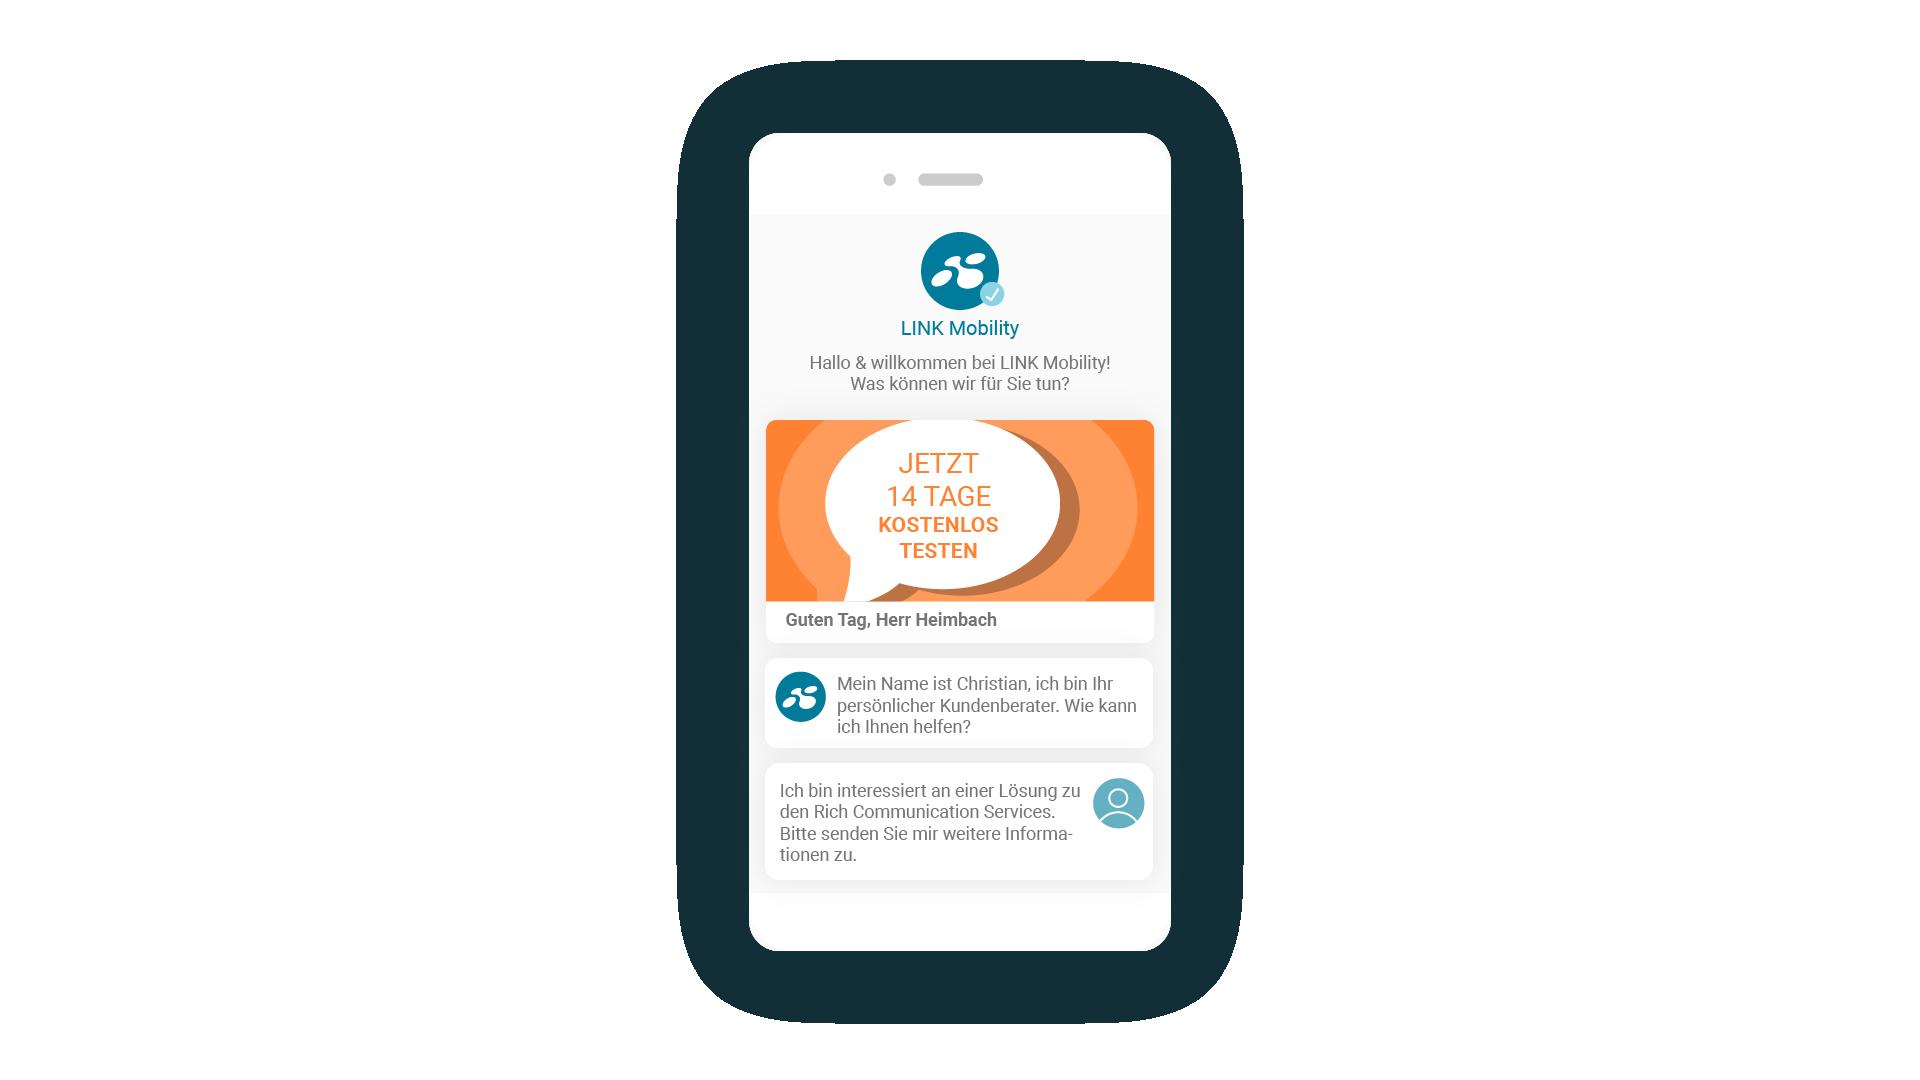 LINK Mobility - RCS Nachricht vom Kundensupport inkl. Werbeaktion